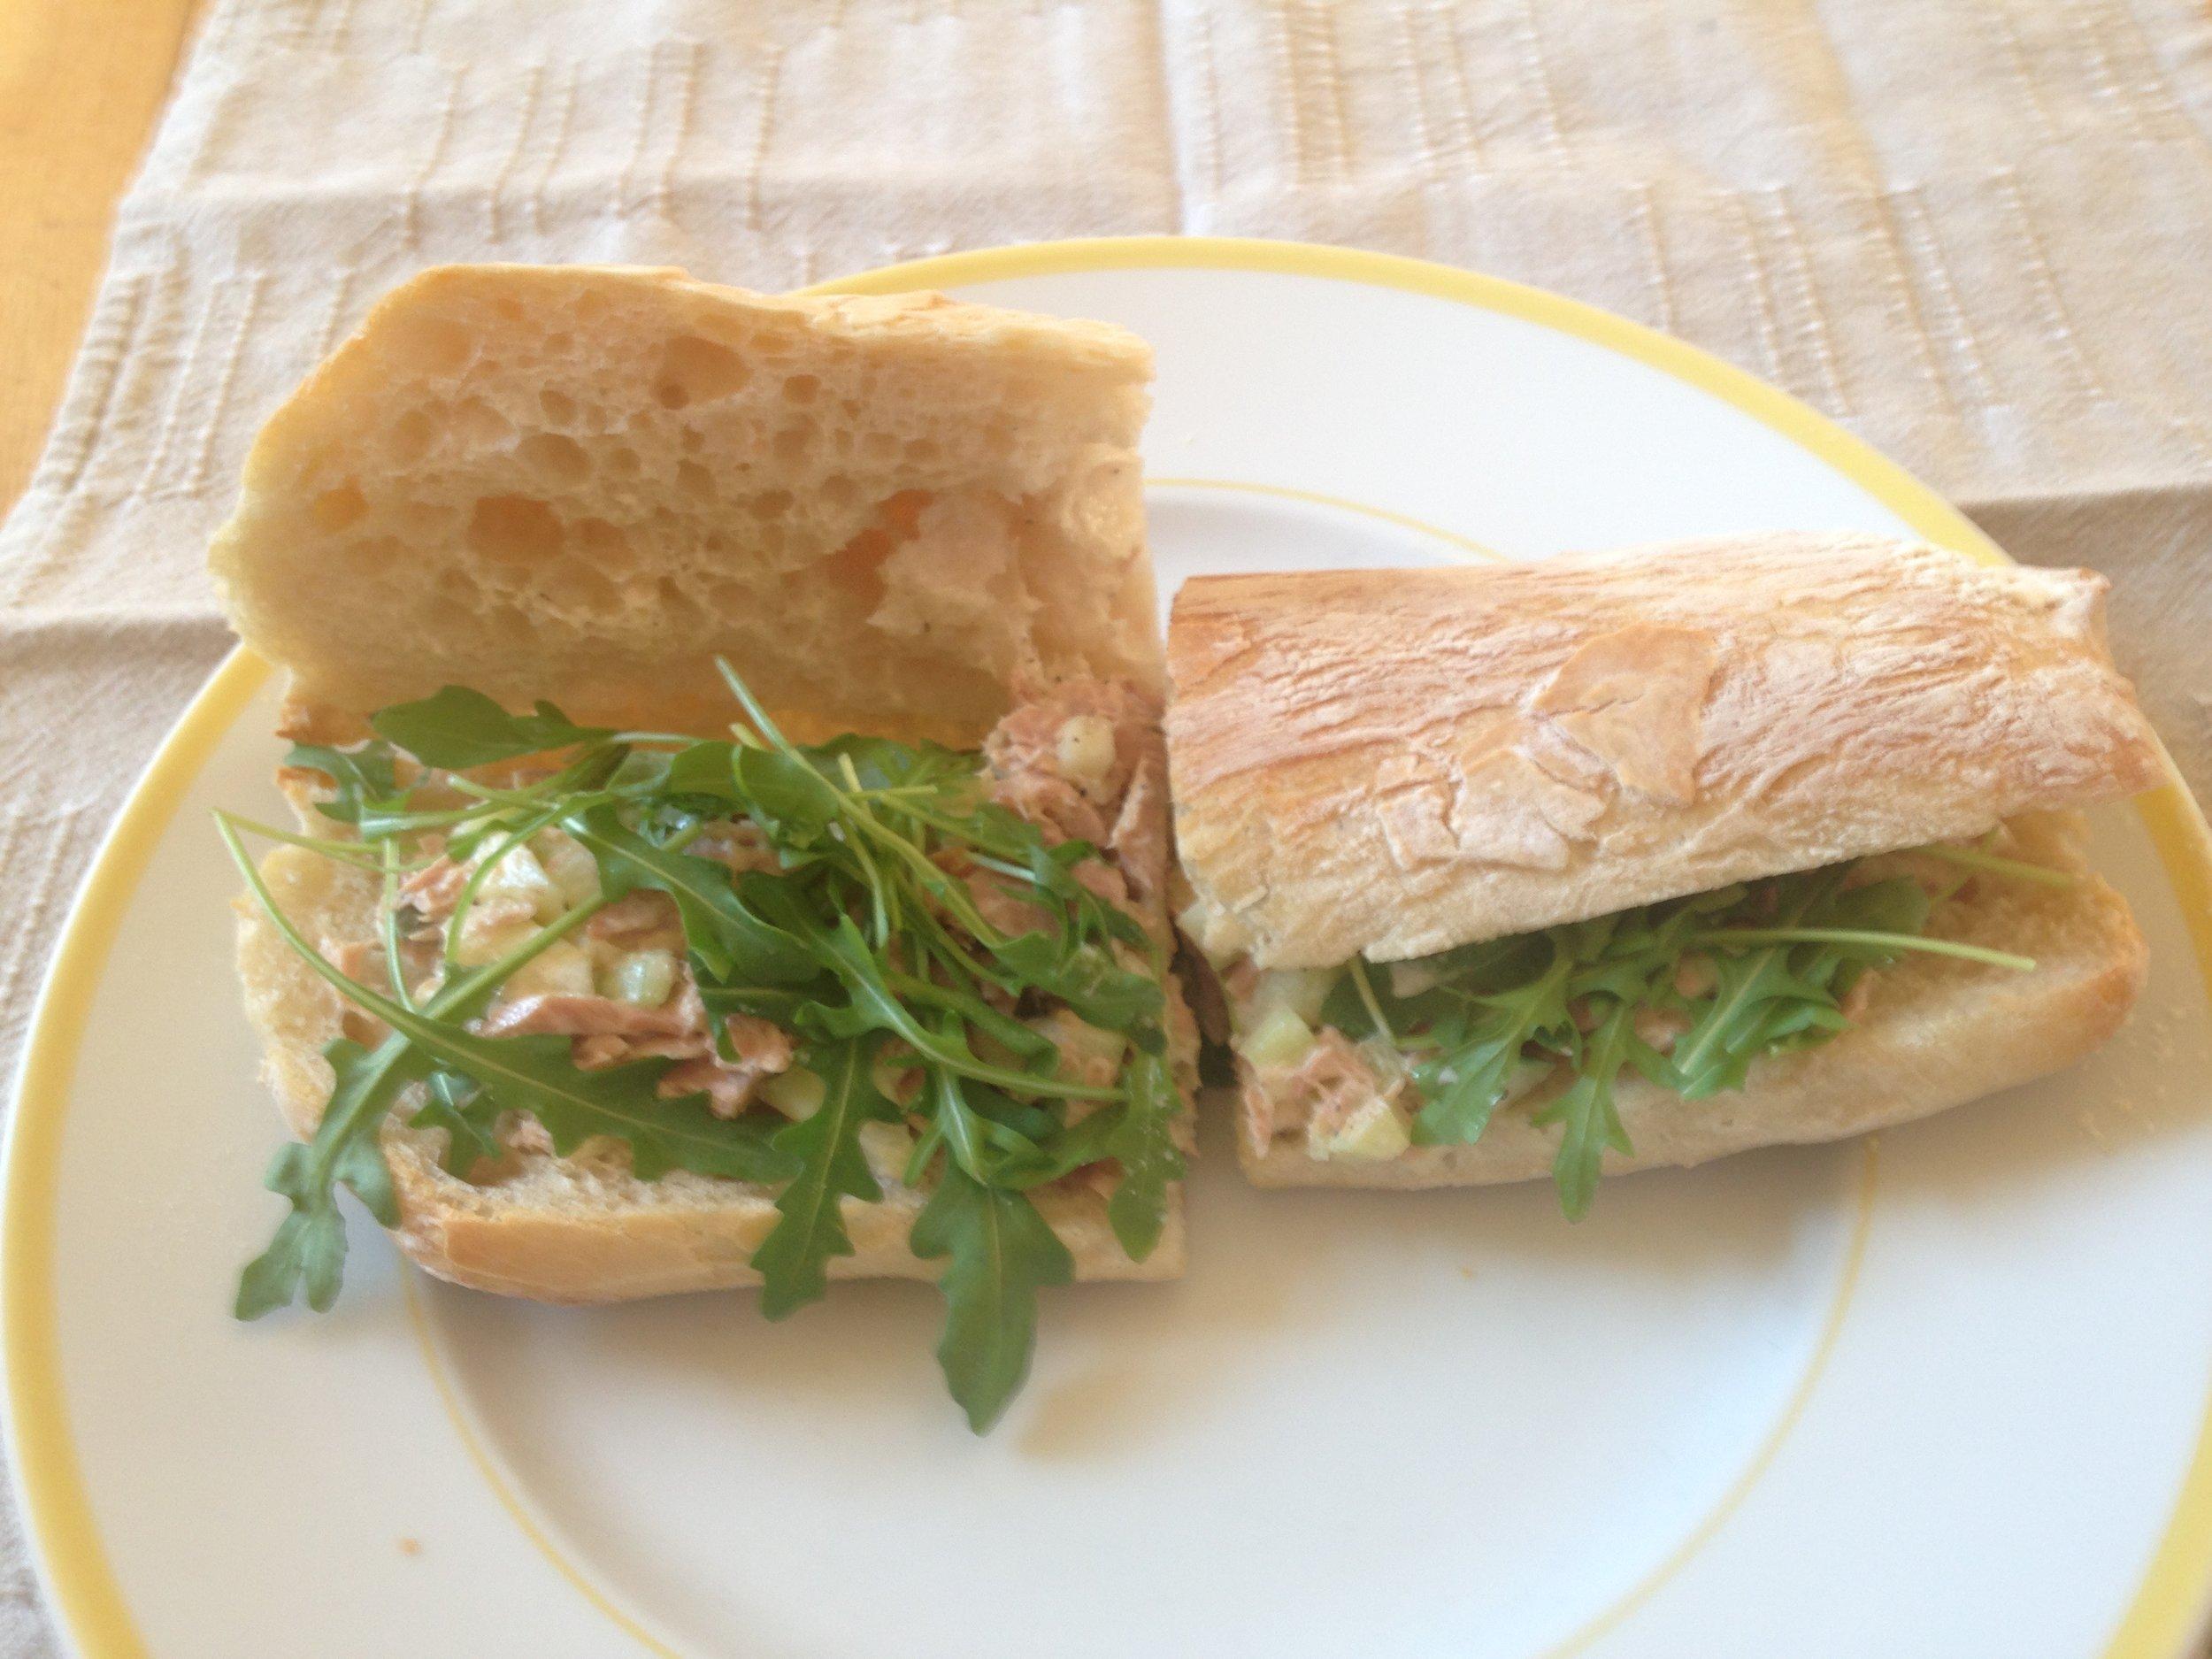 Current day bread choice: ciabatta